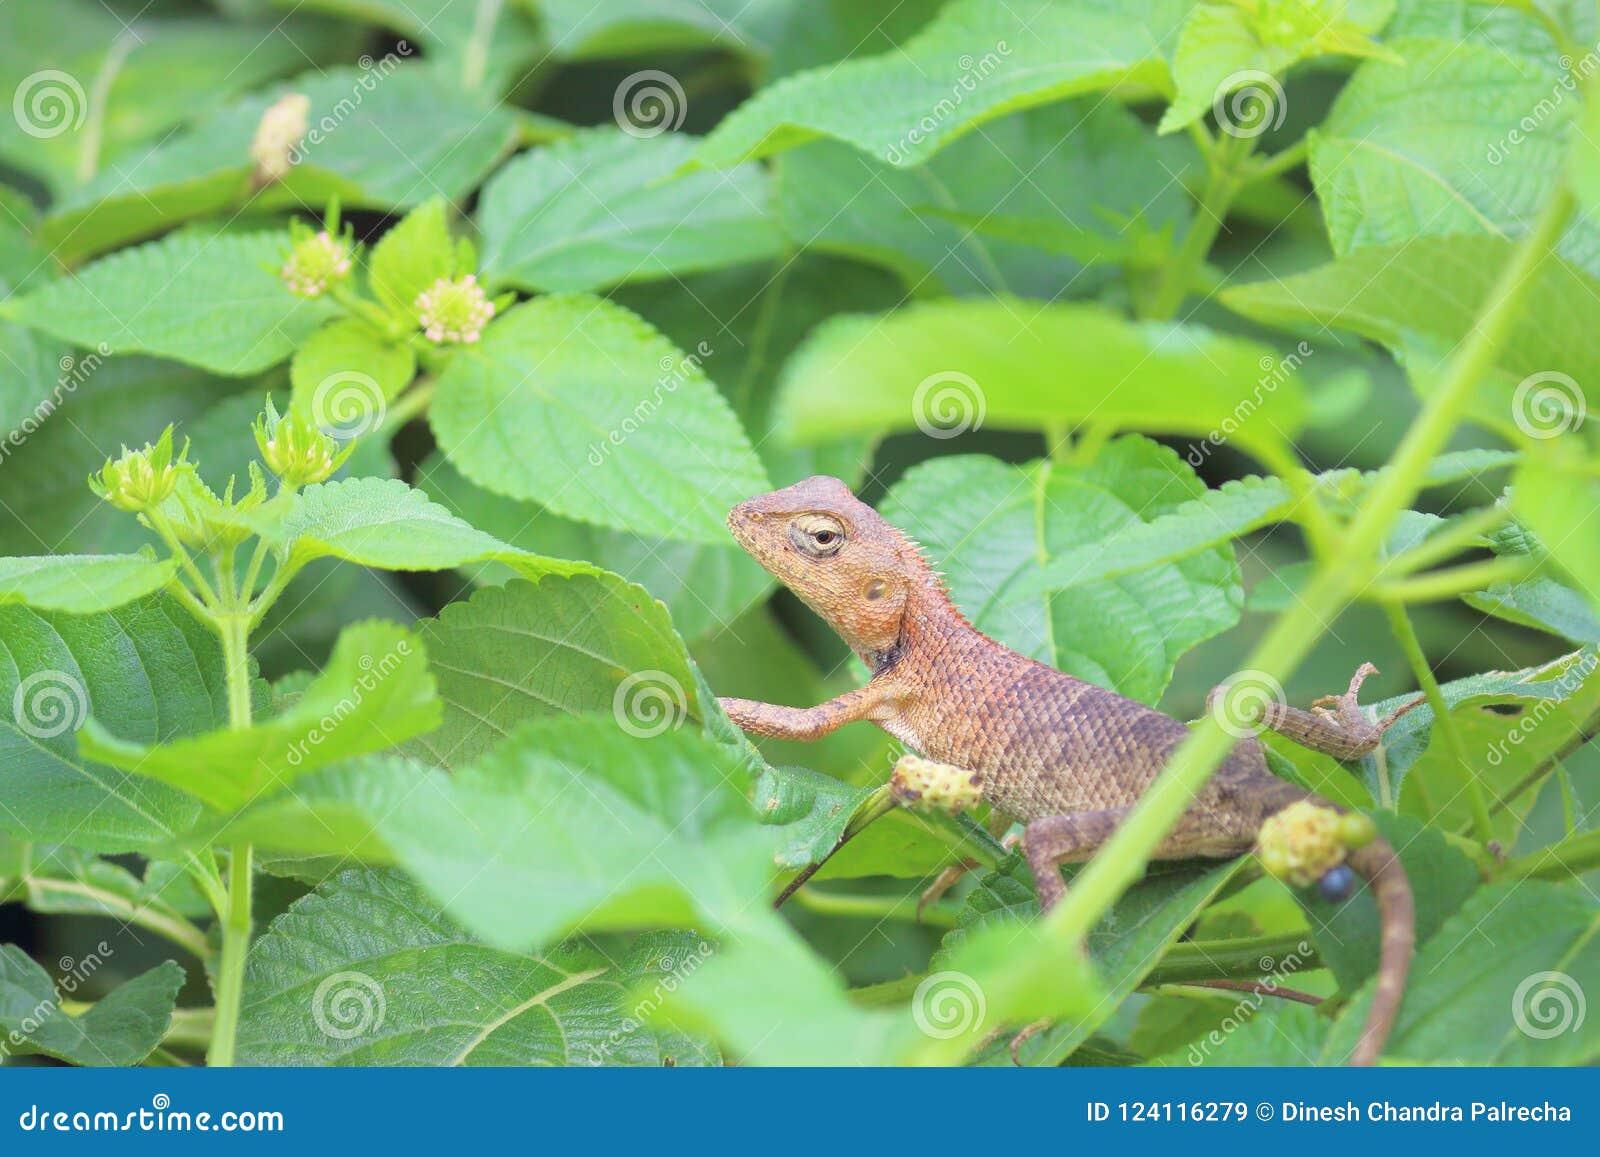 Chameleon Animal Stock Image Image Of Brown Looking 124116279